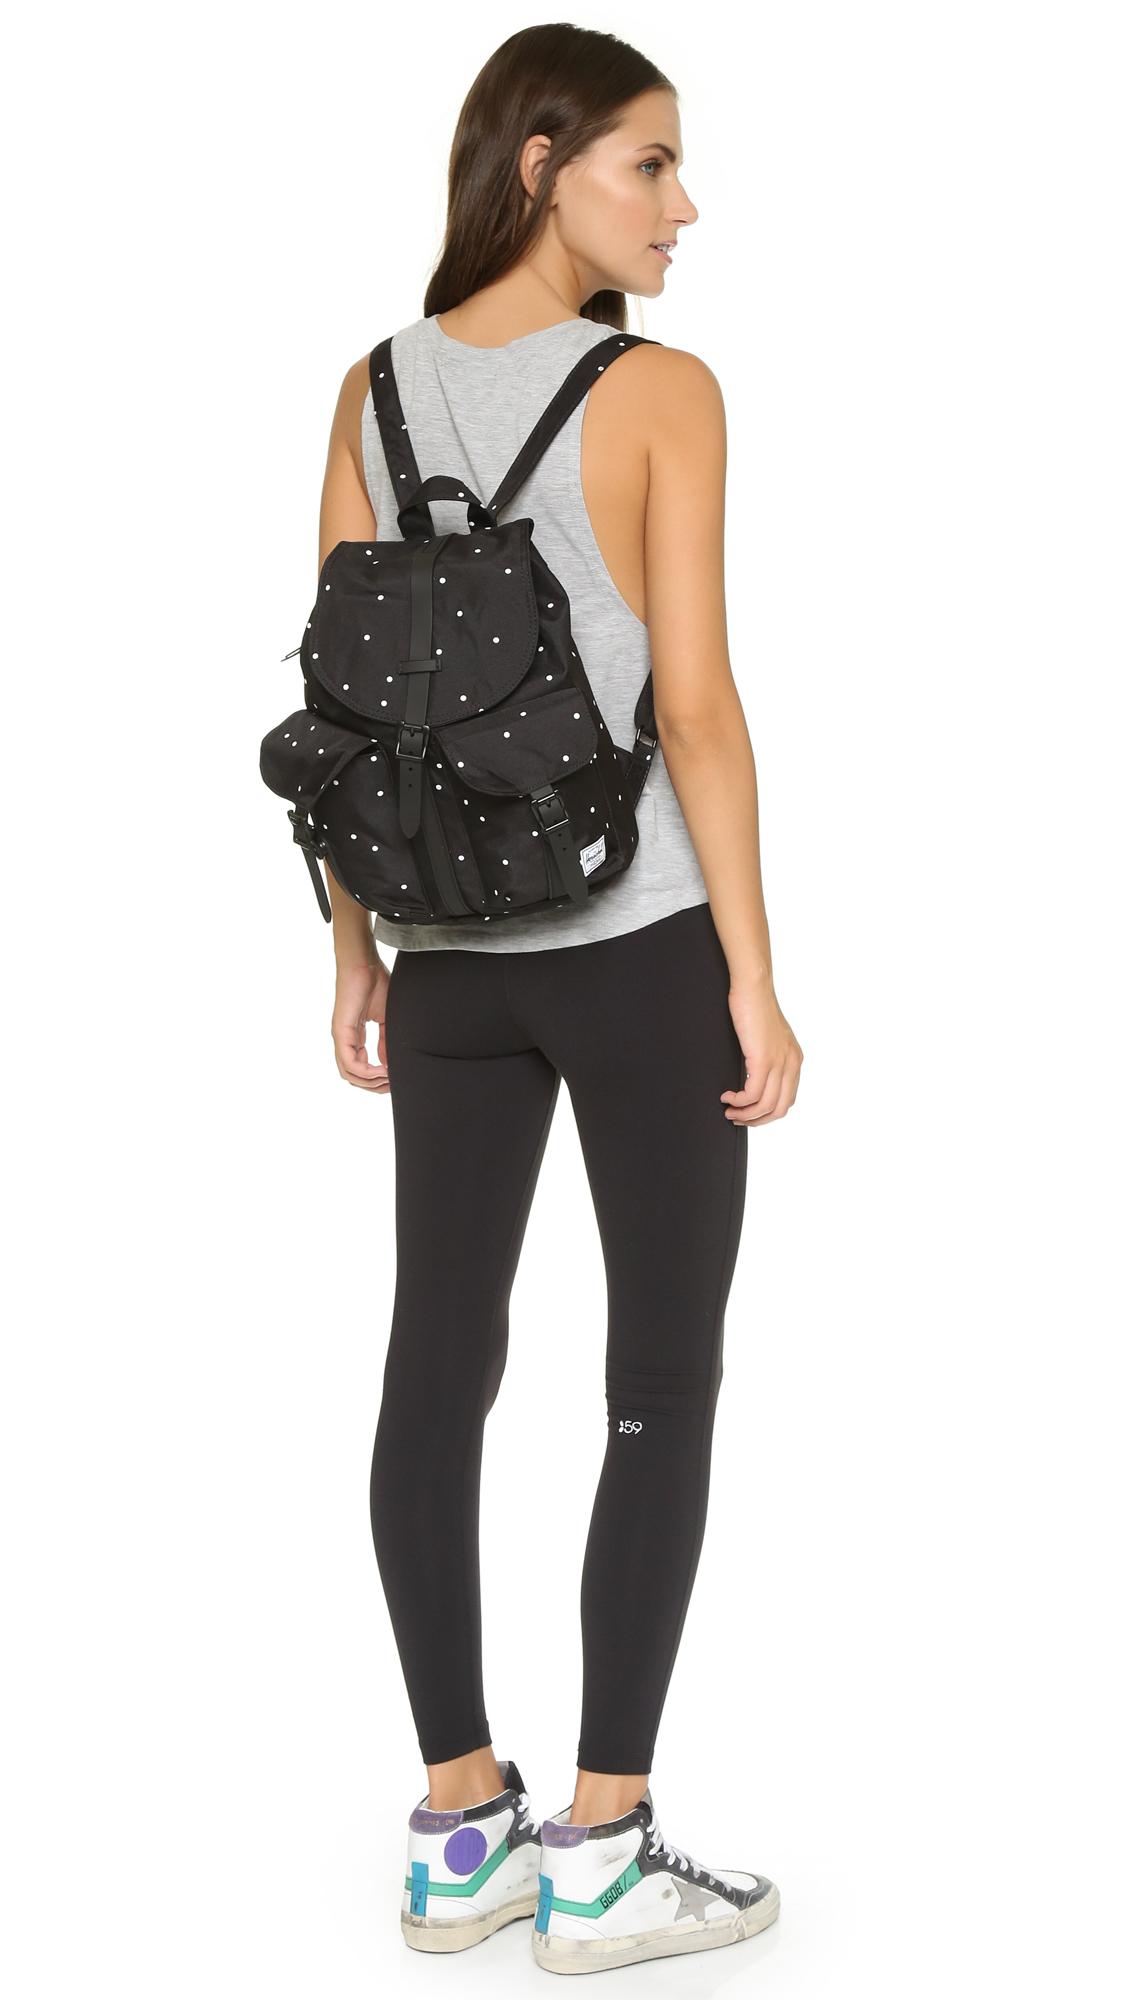 c369a5e71e8 Herschel Supply Co. Dawson Backpack - Scattered Black black in Black ...